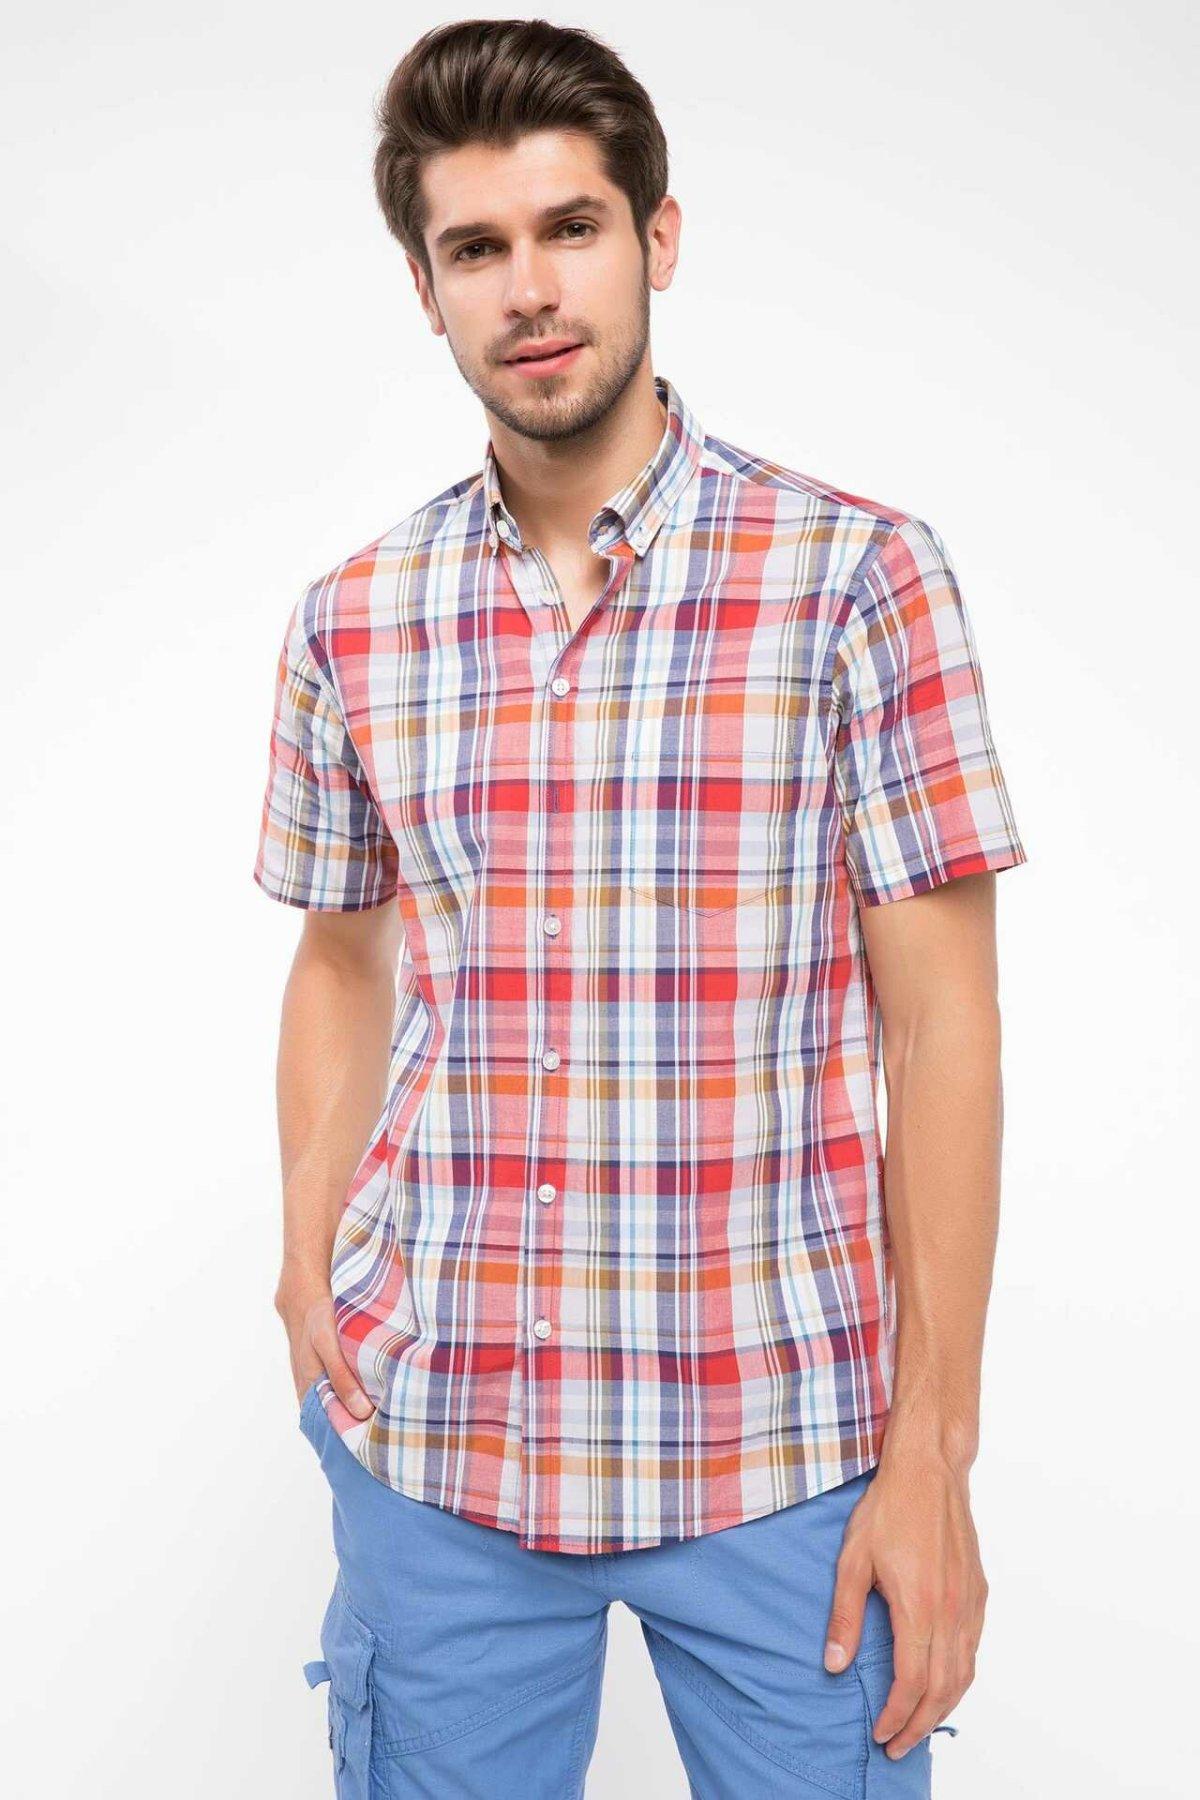 DeFacto Men Summer Woven Top Short Sleeve Shirts Casual Plaid Shirts Male Red Grid Shirt Top Cloth  I7814AZ18SMRD283-I7814AZ18SM